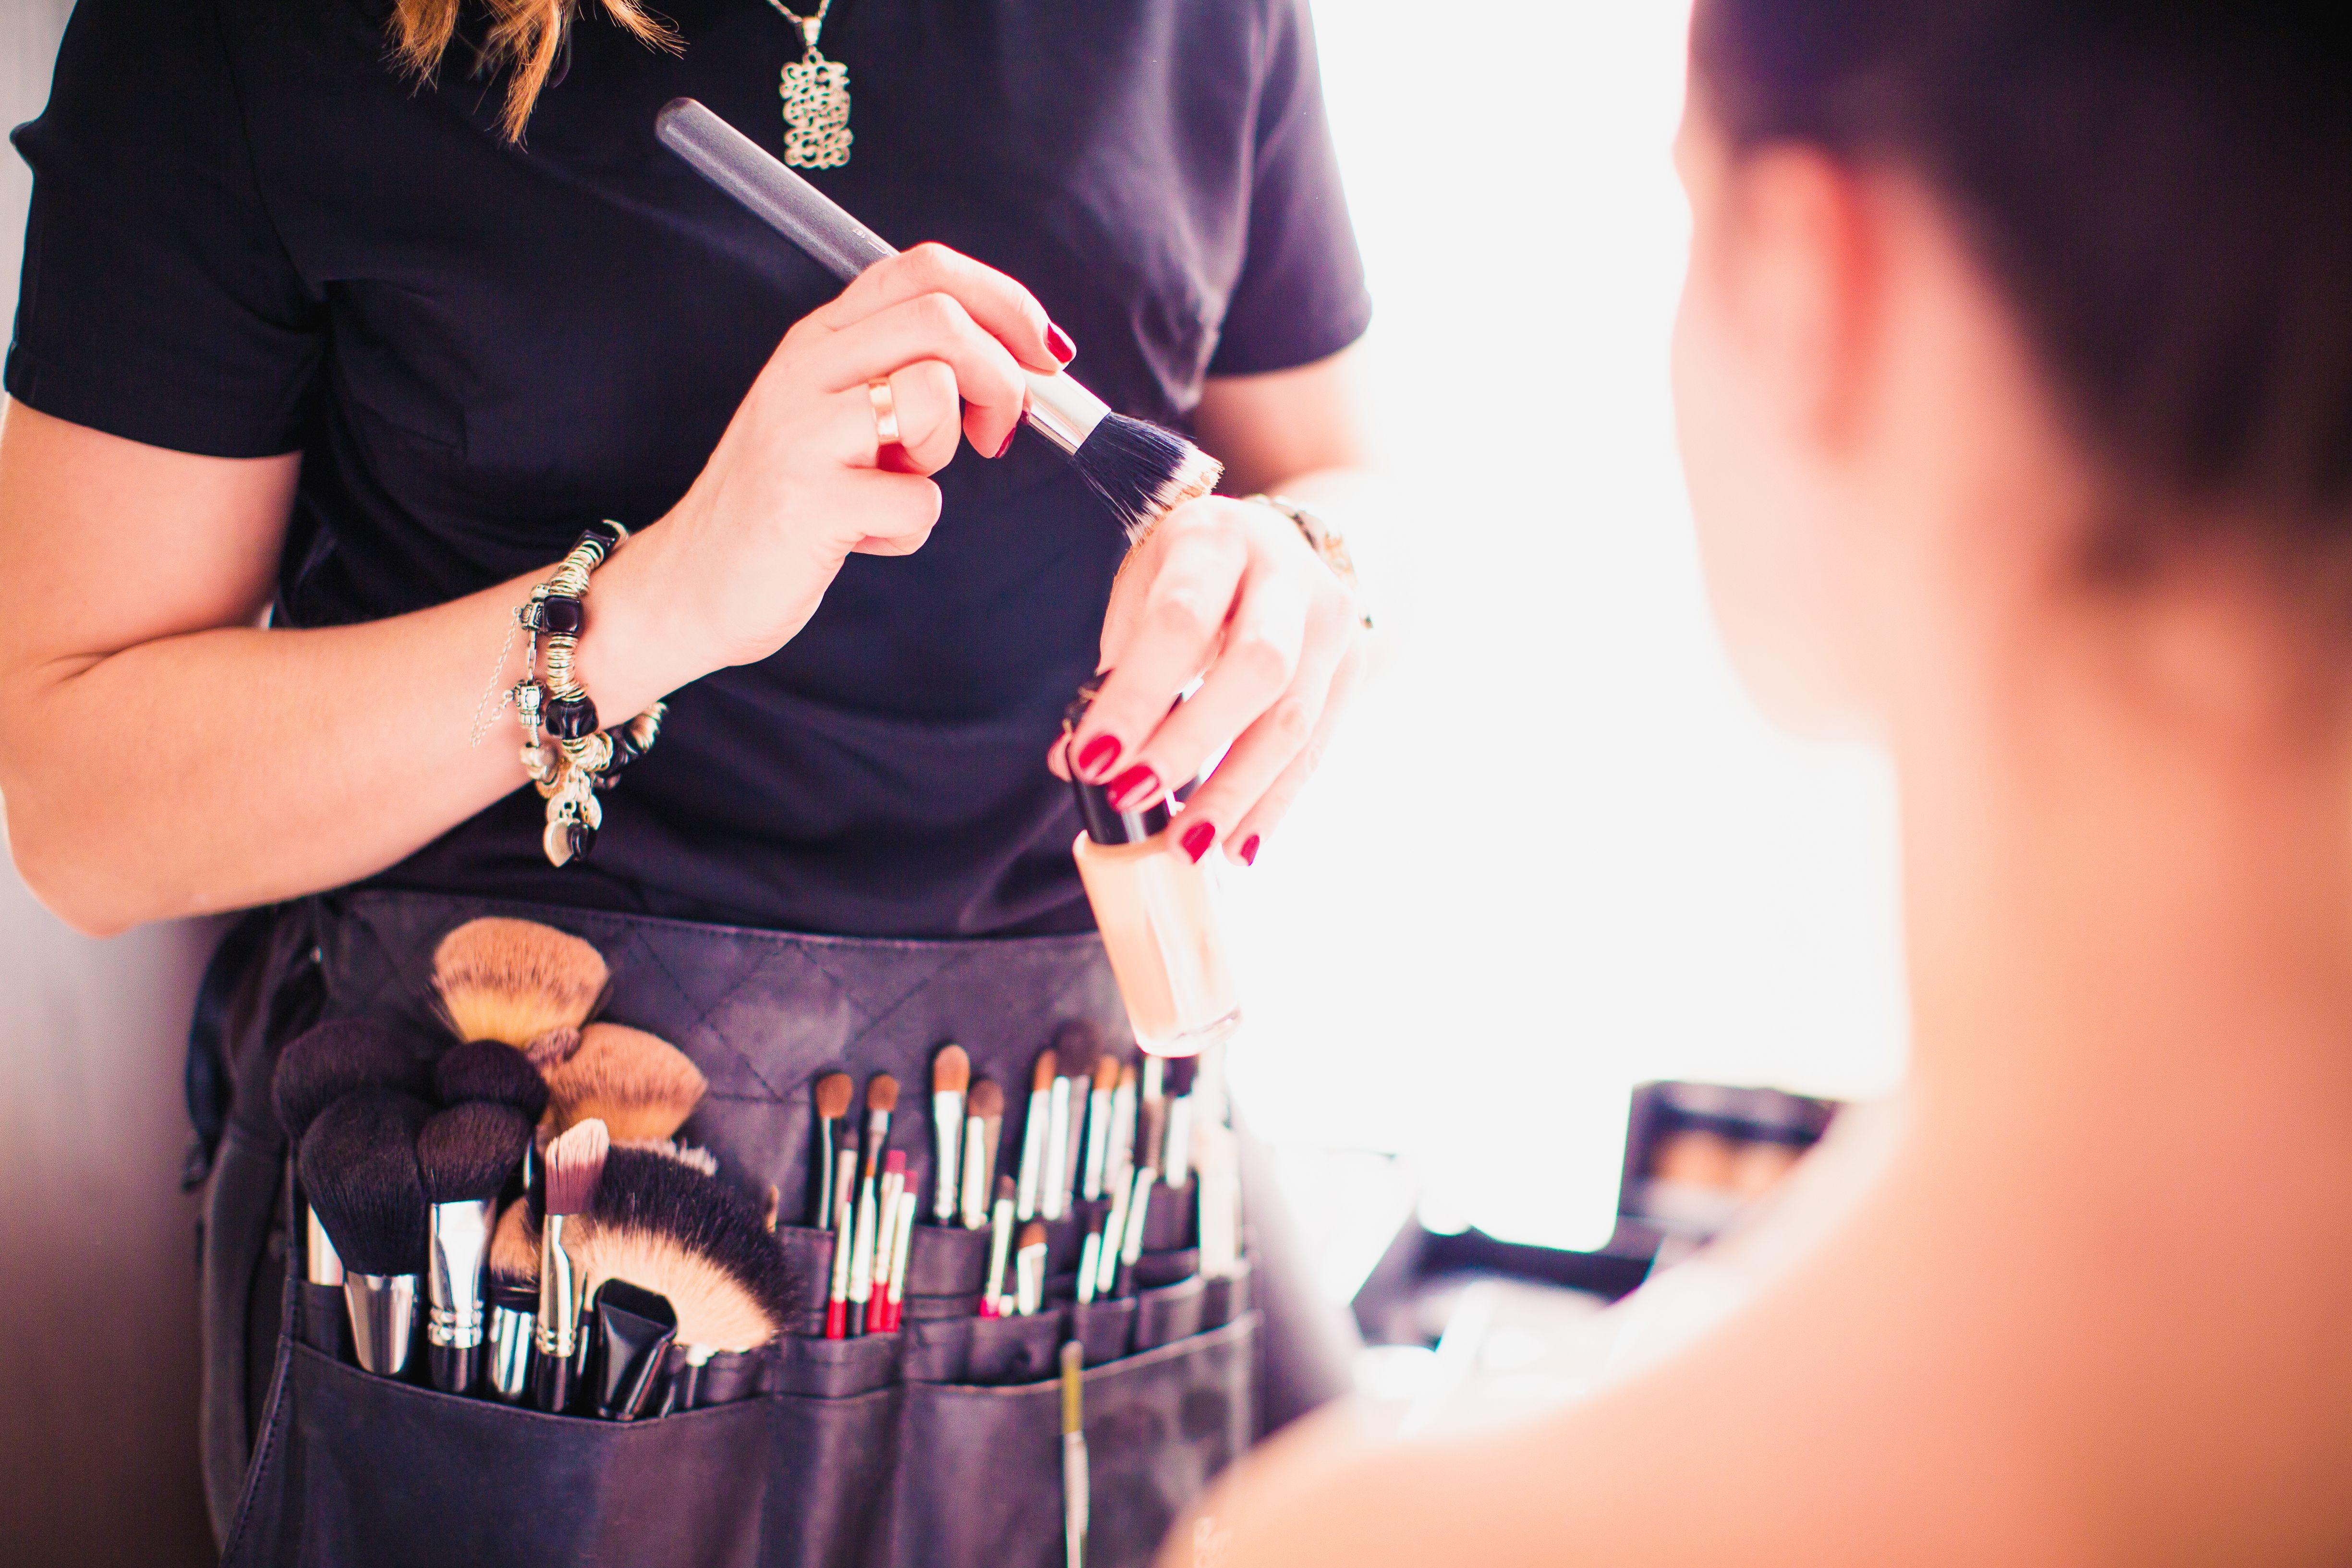 U Zagrebu se otvara prvi beauty outlet: Šminka, kreme i ostala kozmetika do 50 posto jeftiniji!